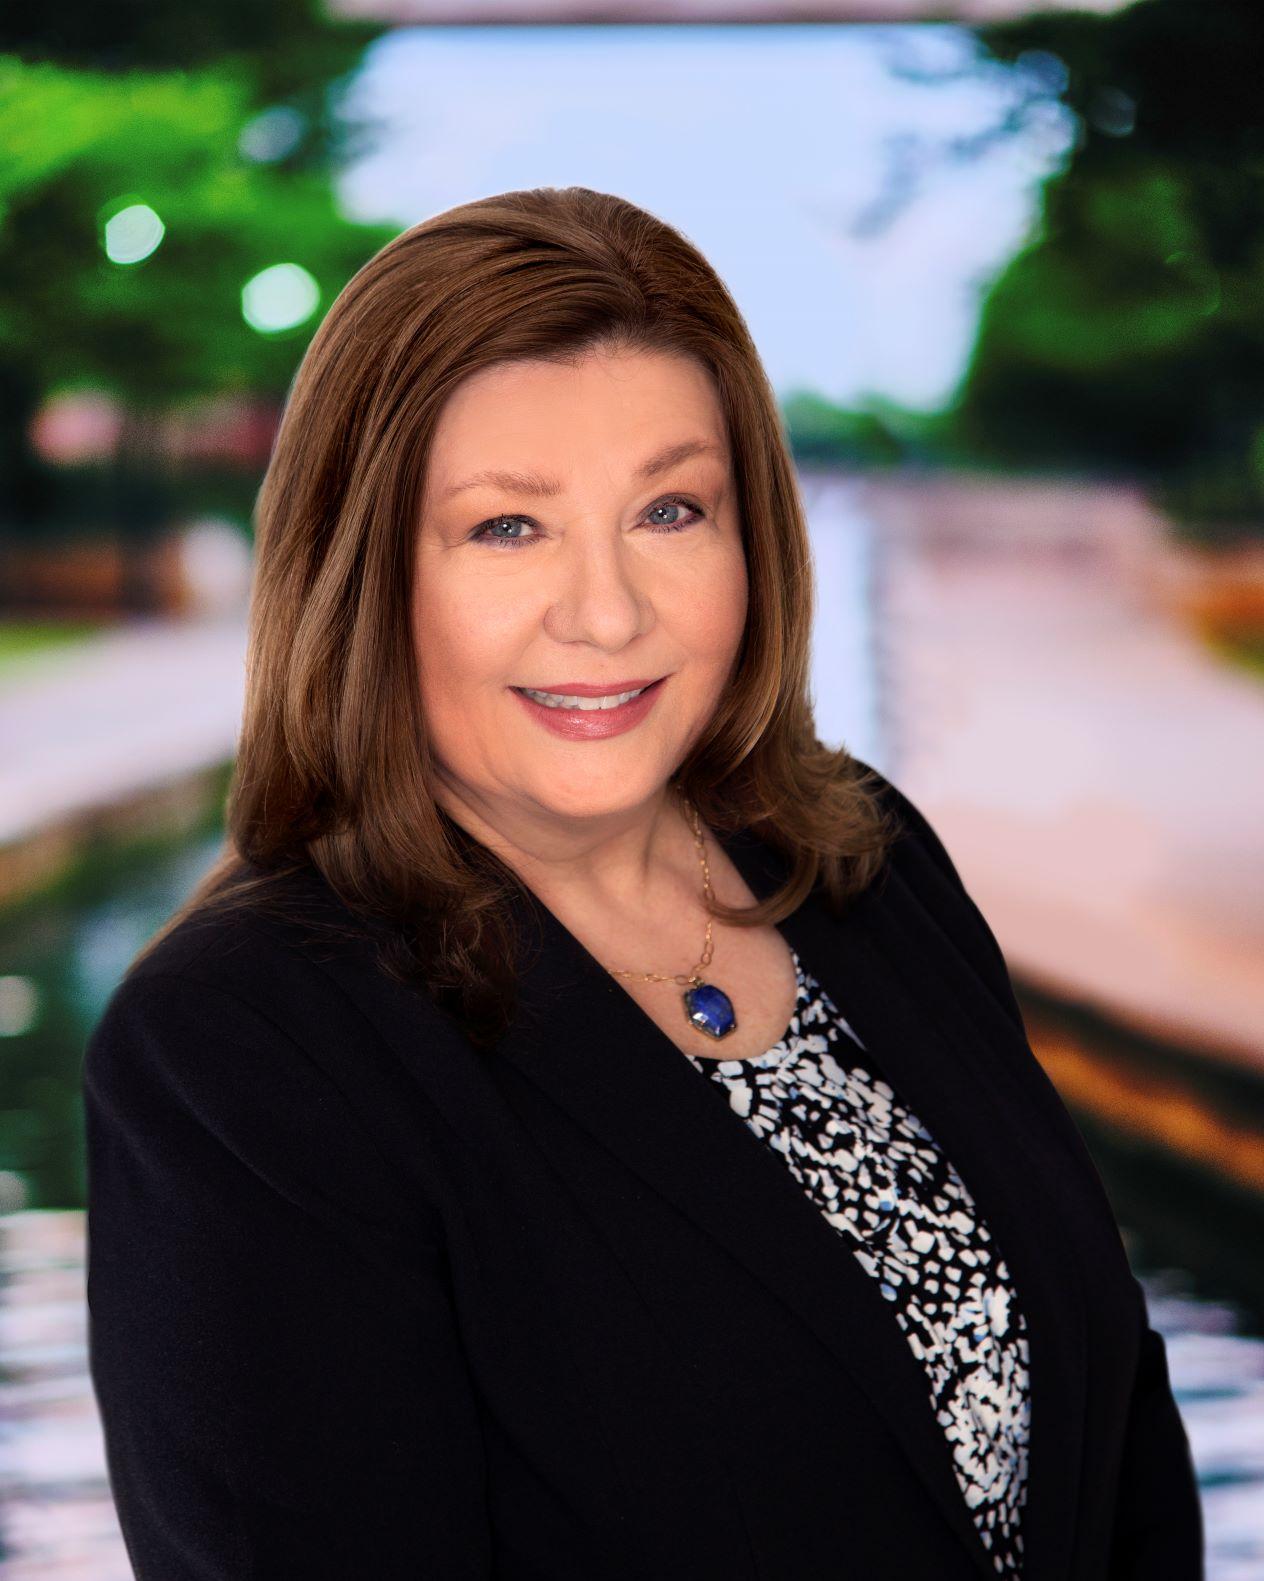 Kathy Tyra